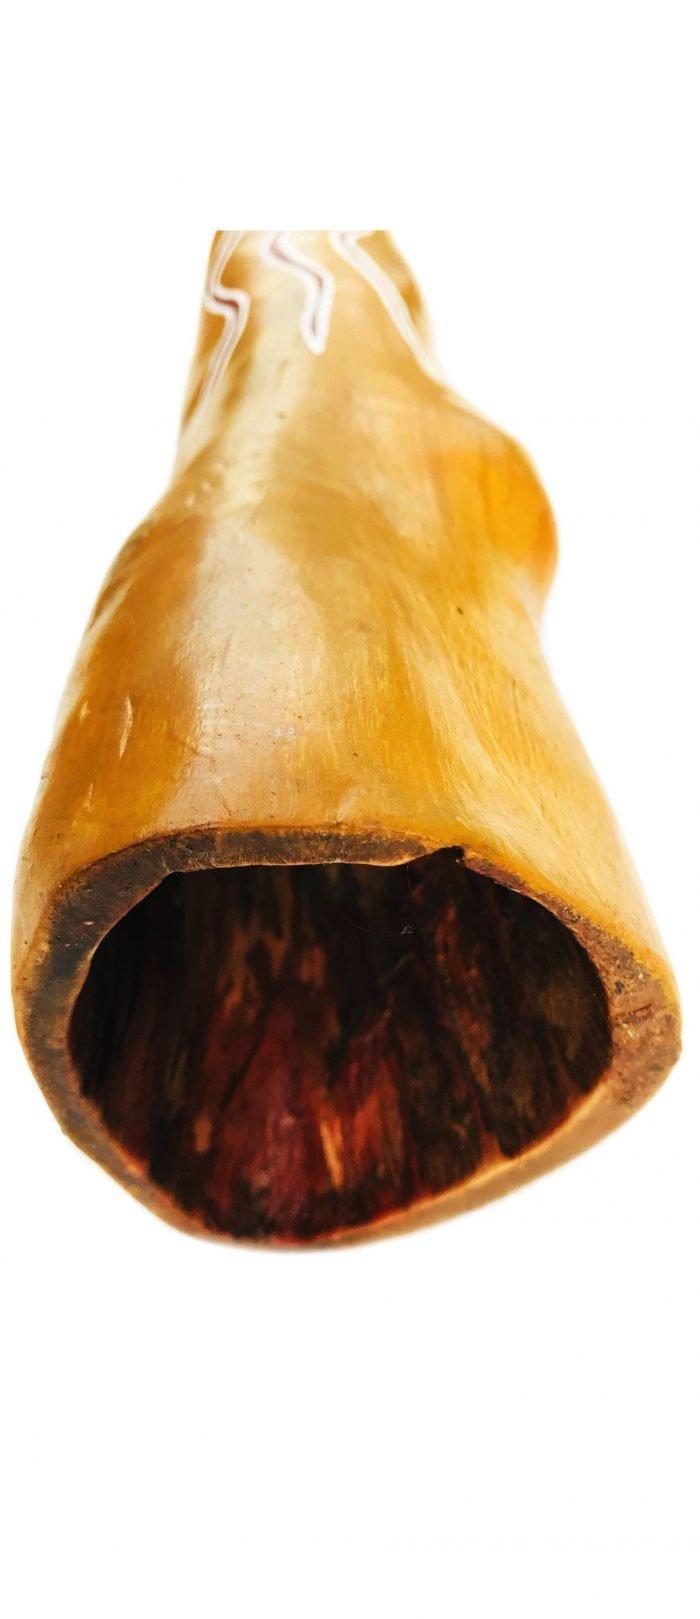 Wapurrpurr Wunungmurra yidaki (HLY-236) bell